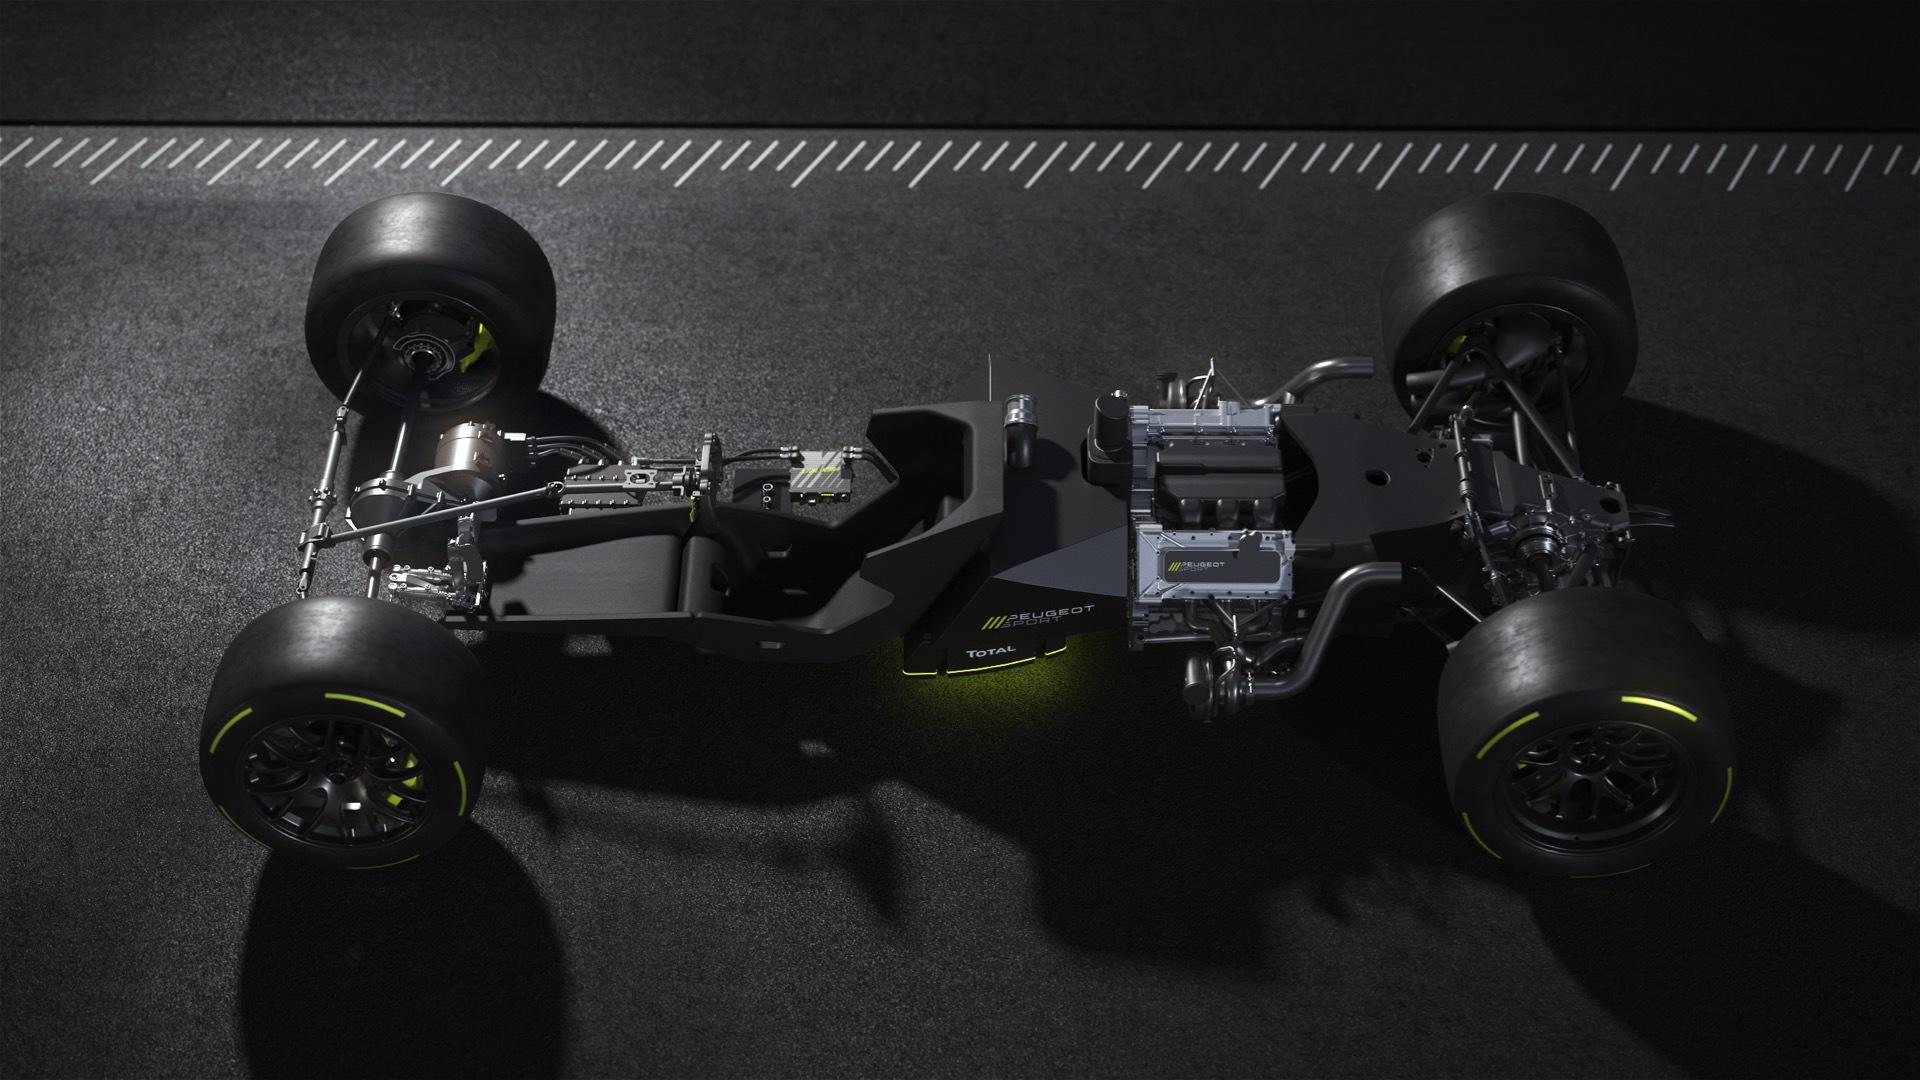 2022 Peugeot 9X8 Le Mans Hypercar race car